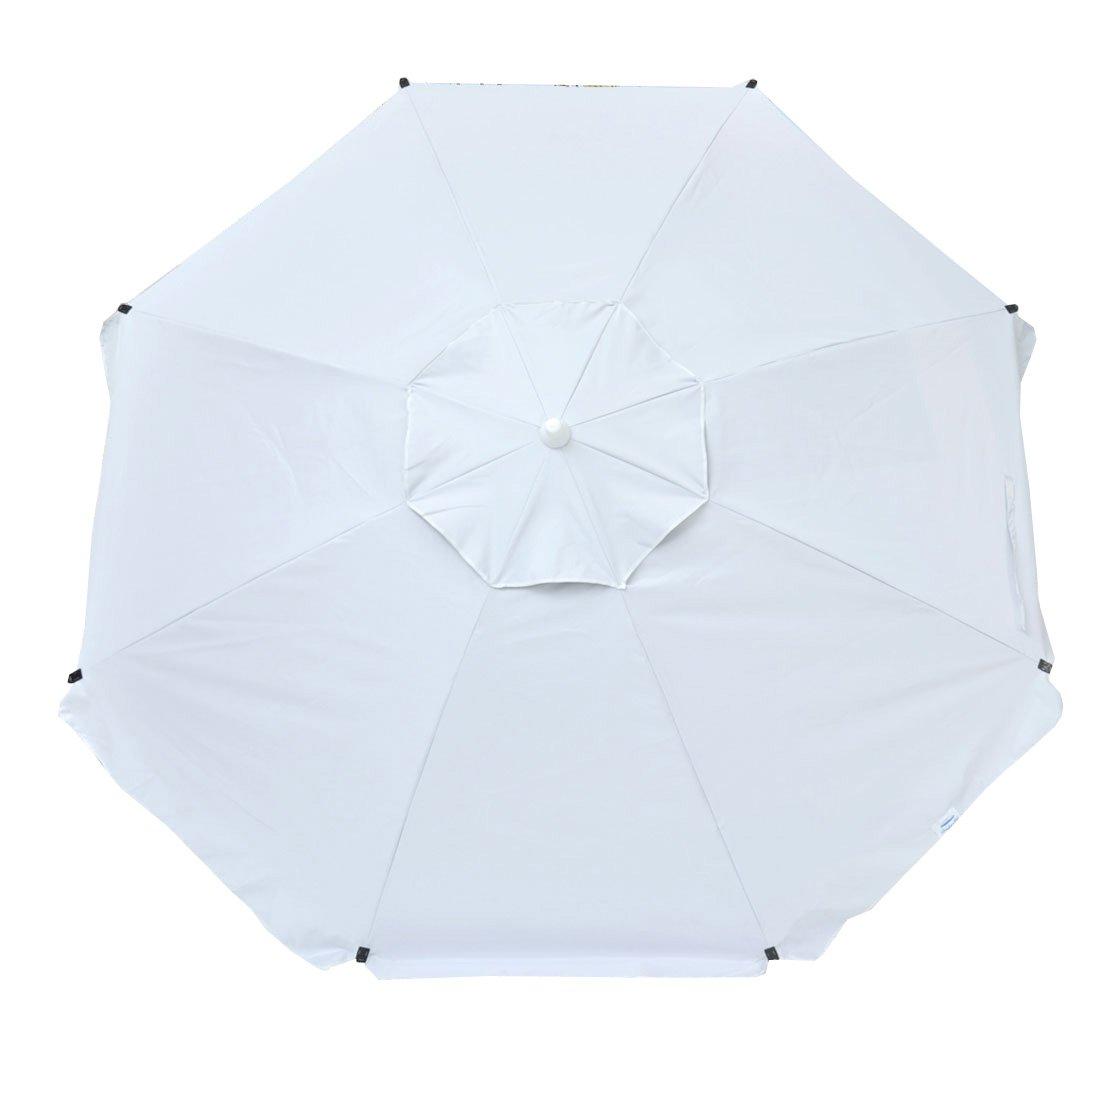 Accessory Hook 8 ft Heavy Duty Beach Umbrella with Fiberglass Ribs Carry Bag